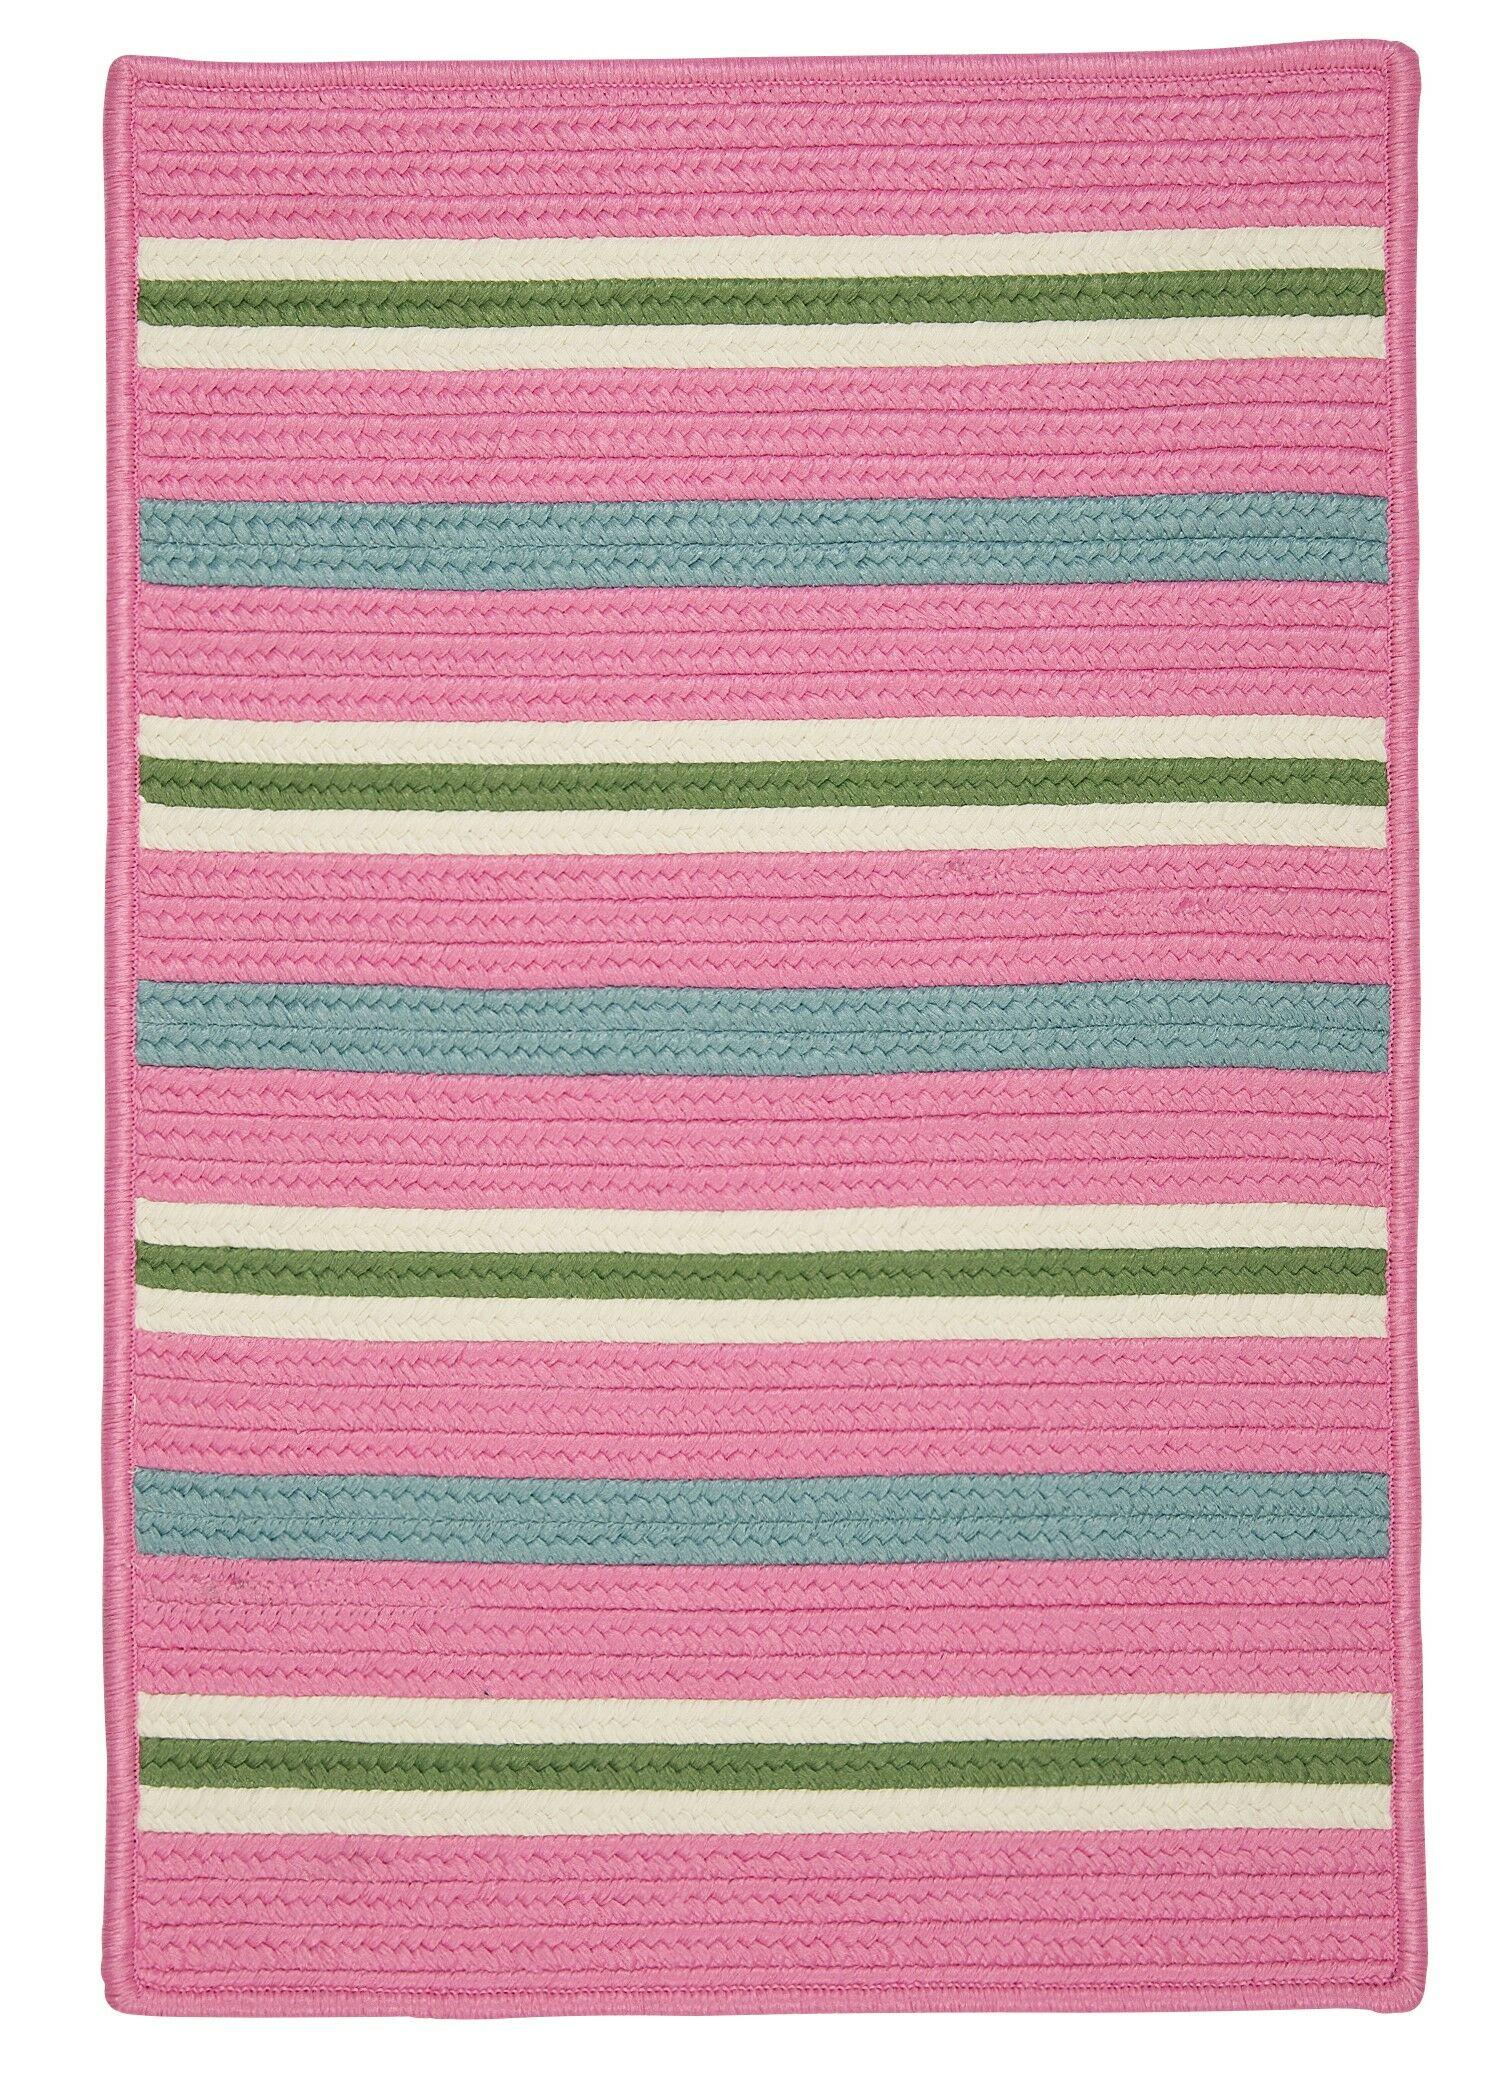 Painter Stripe Spring Pink Indoor/Outdoor Area Rug Rug Size: 5' x 7'